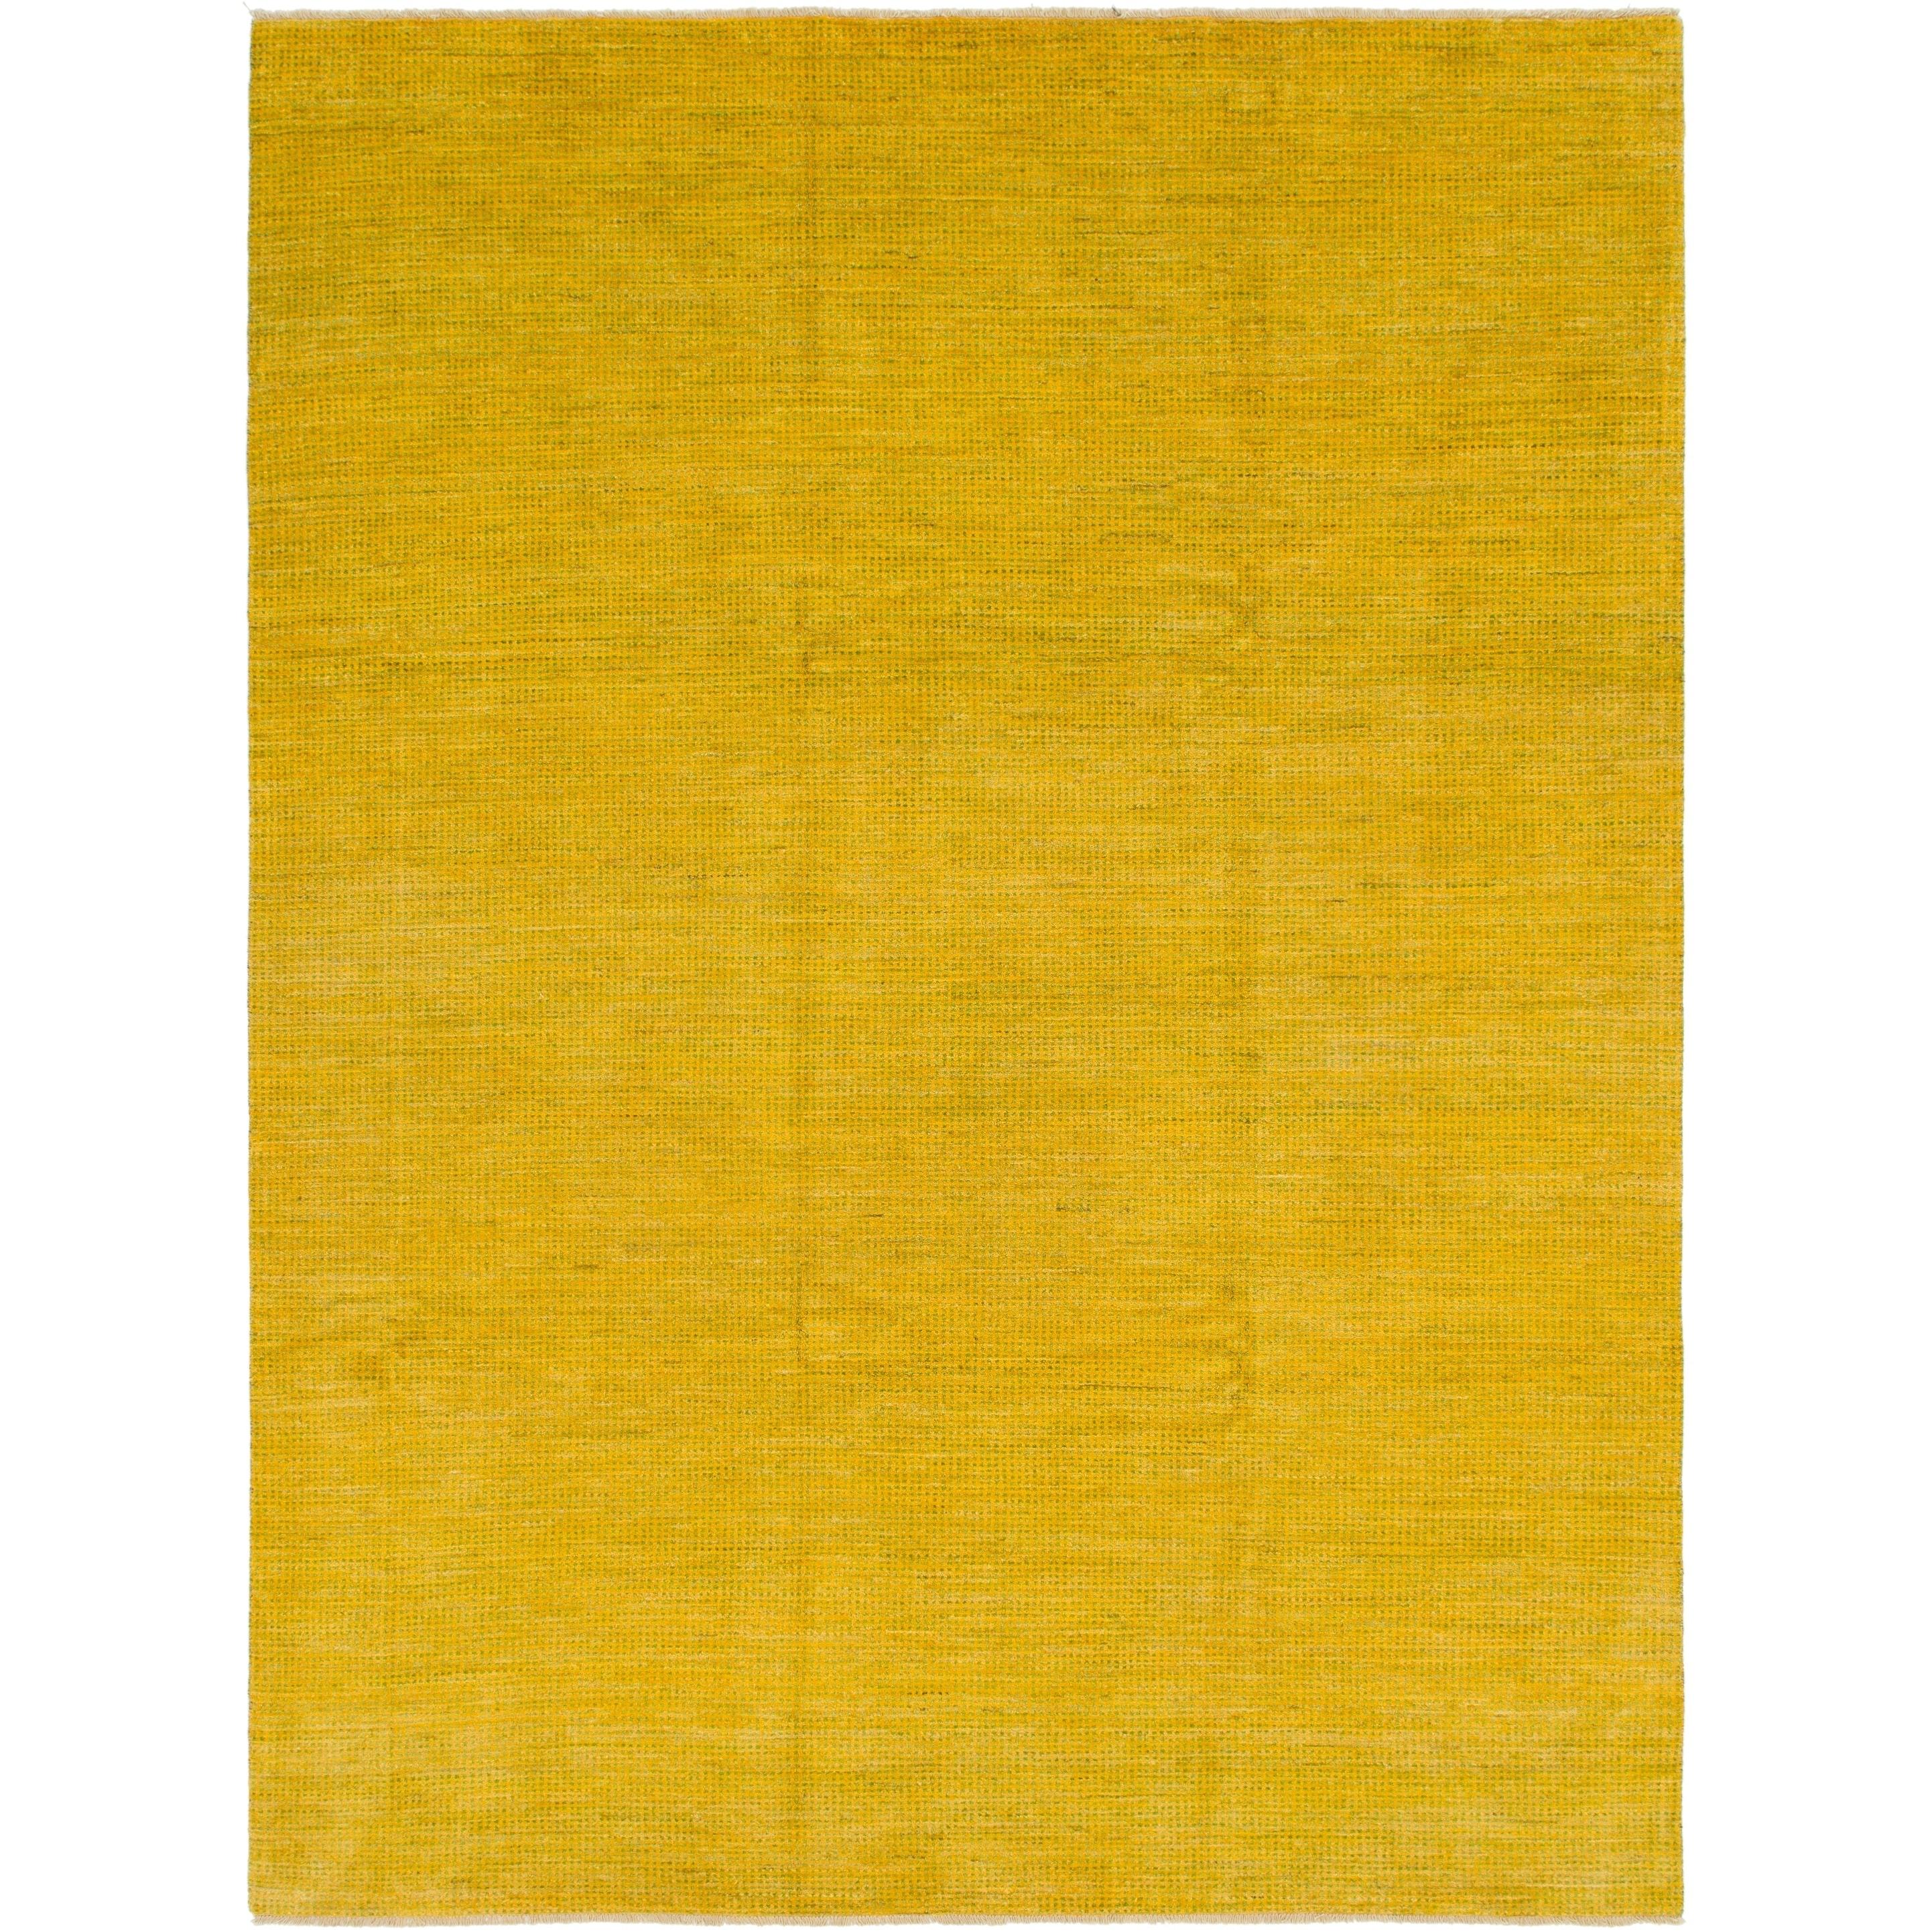 Hand Knotted Kashkuli Gabbeh Wool Area Rug - 8 6 x 11 2 (Yellow - 8 6 x 11 2)